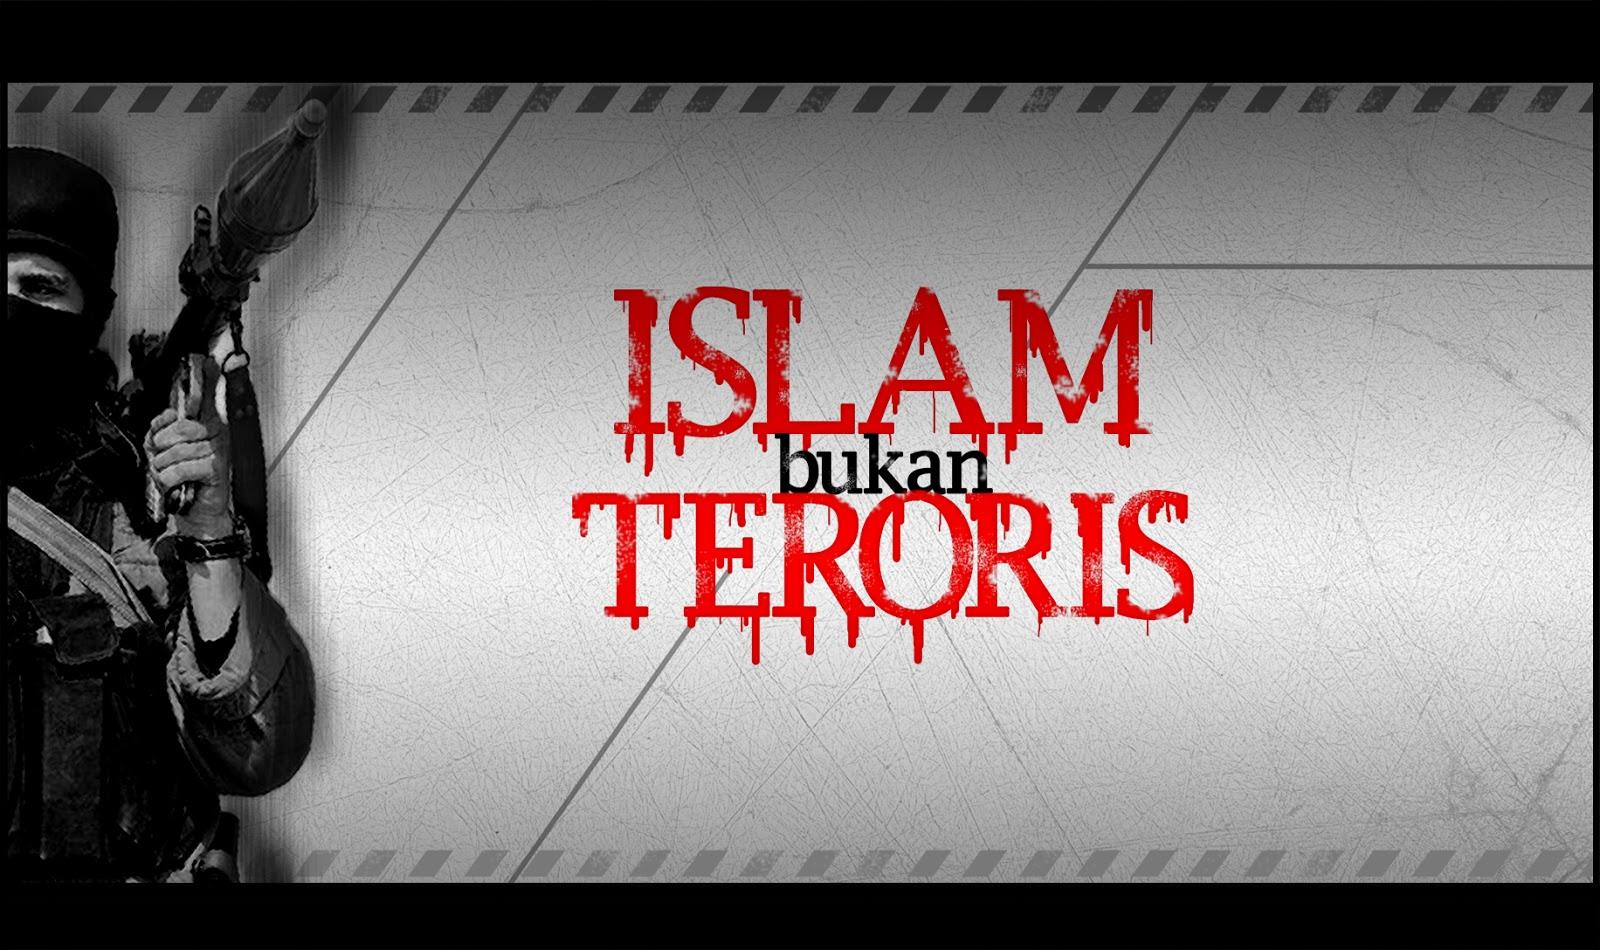 Menggoreng Isu Terorisme: PROYEK PENGKERDILAN ISLAM?